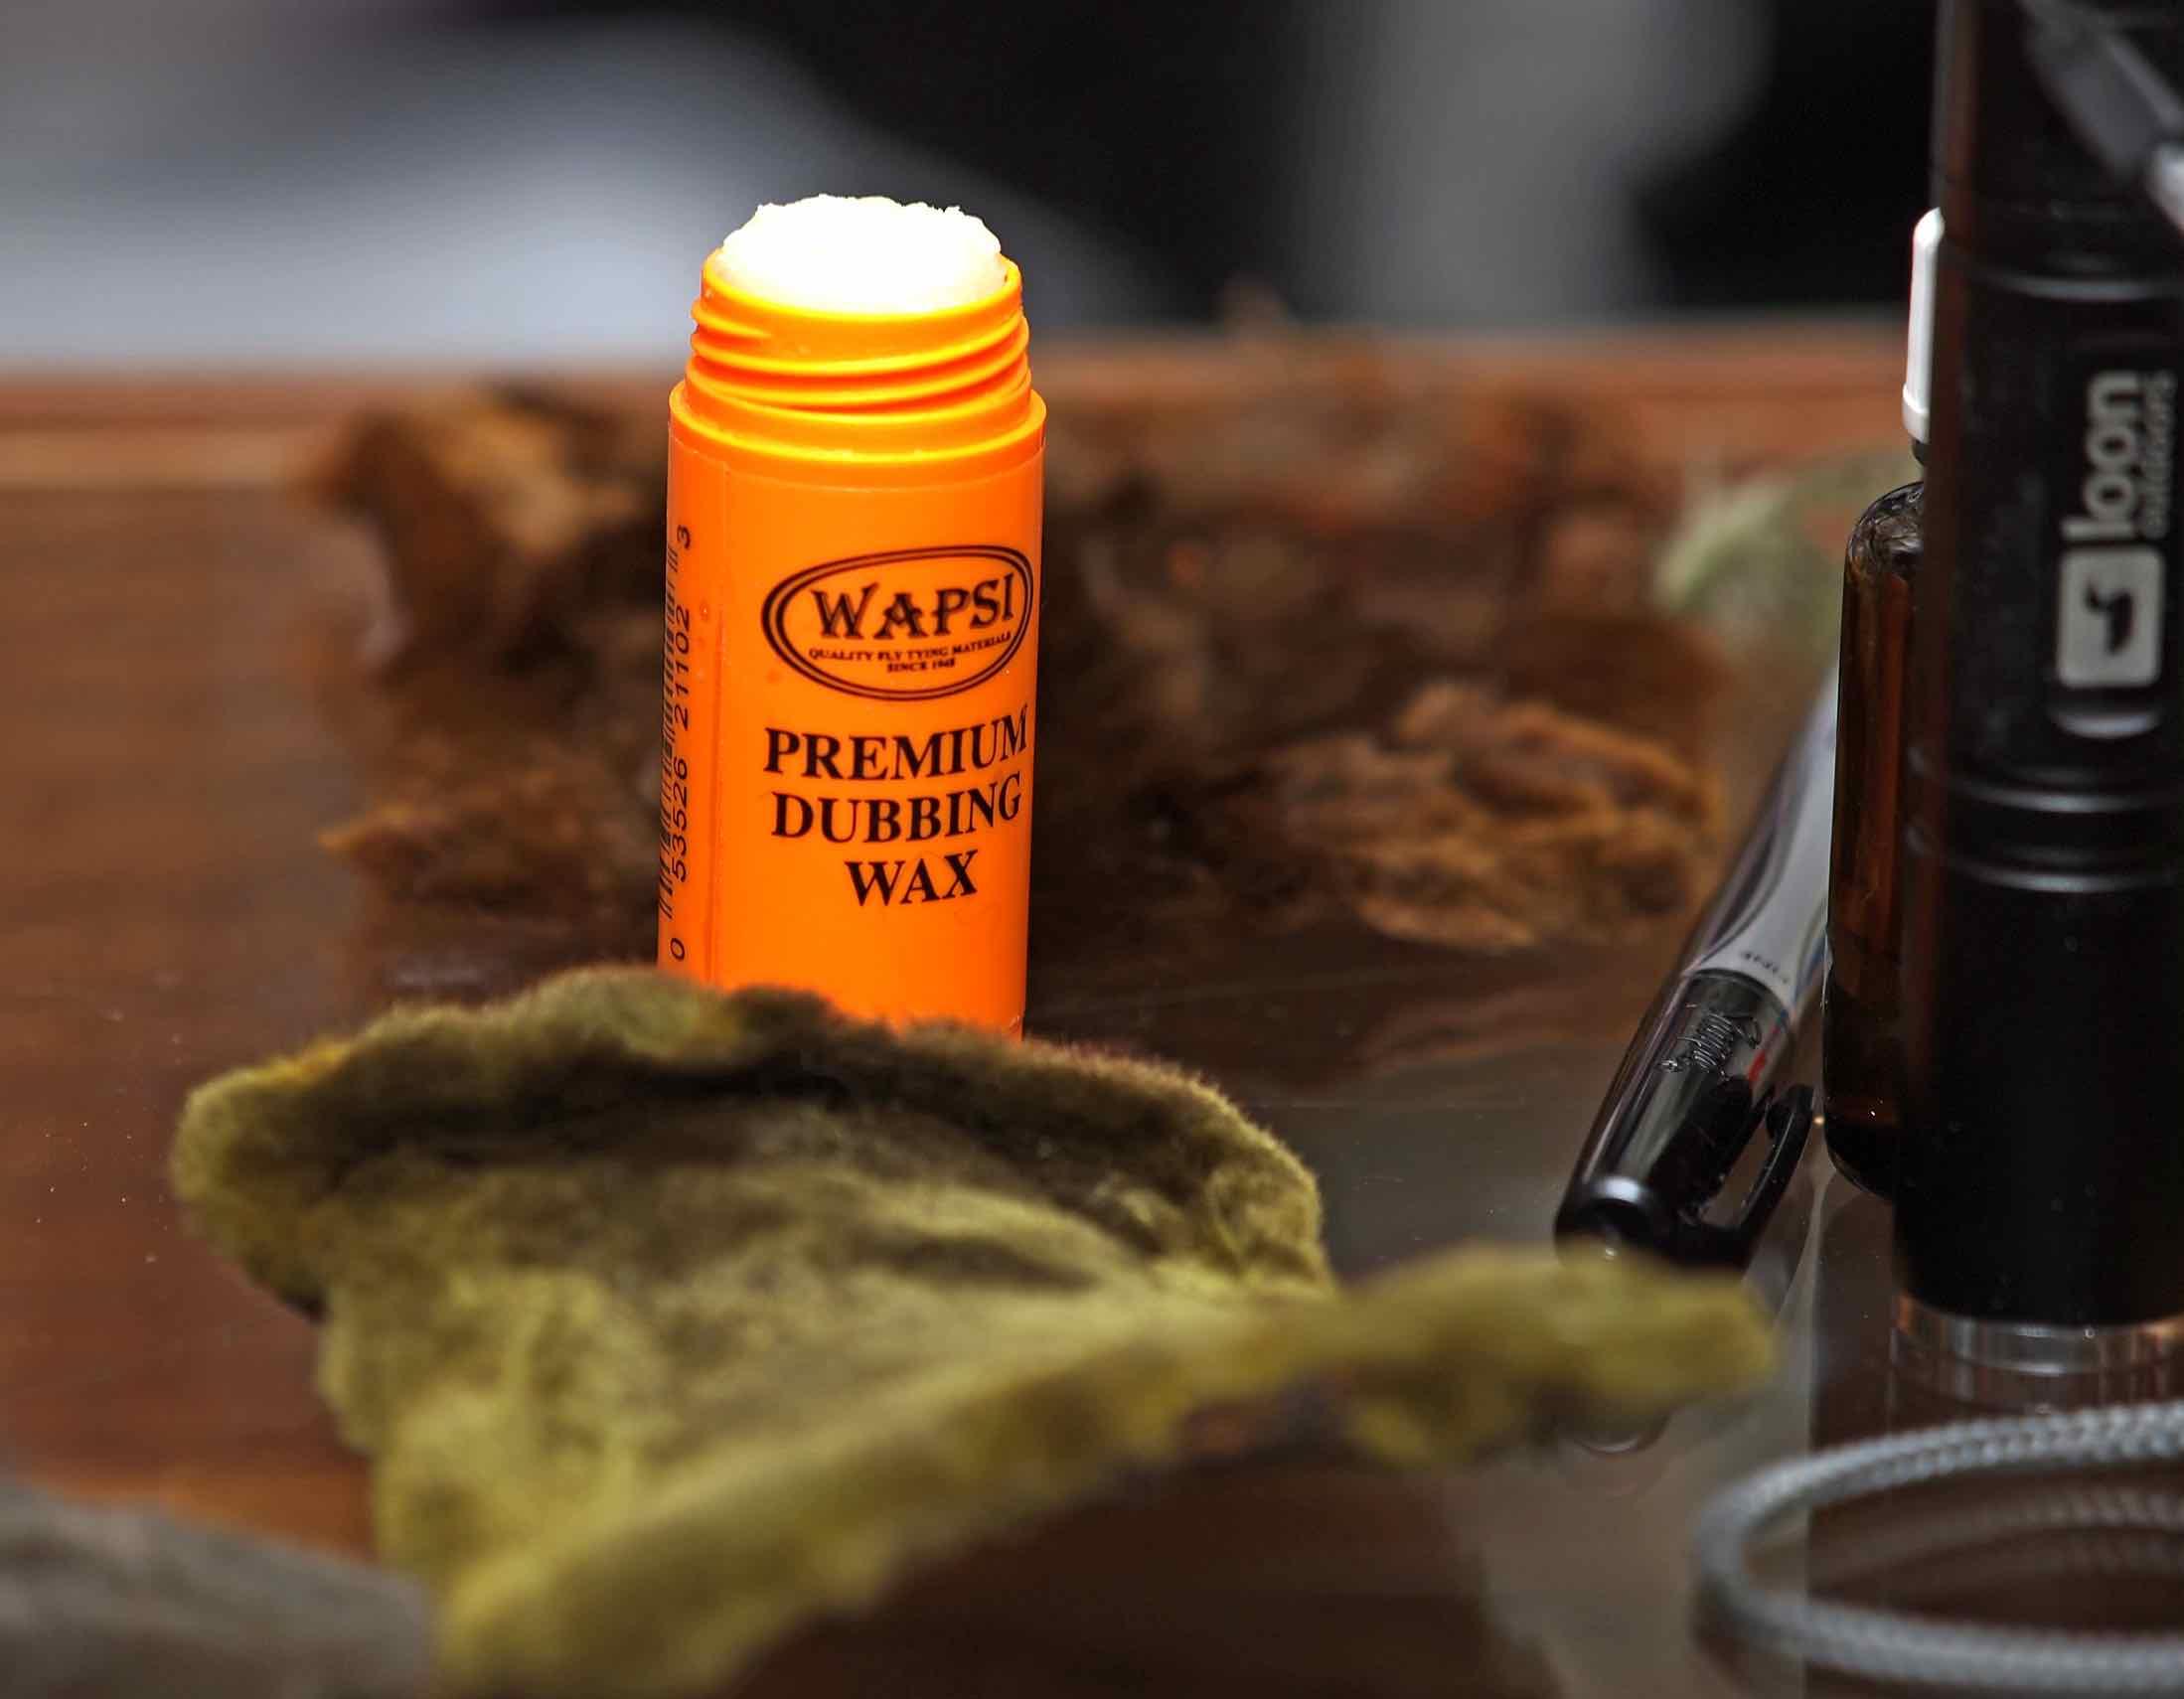 Wapsi-Premium-Dubbing-Wax-Resized-for-Web